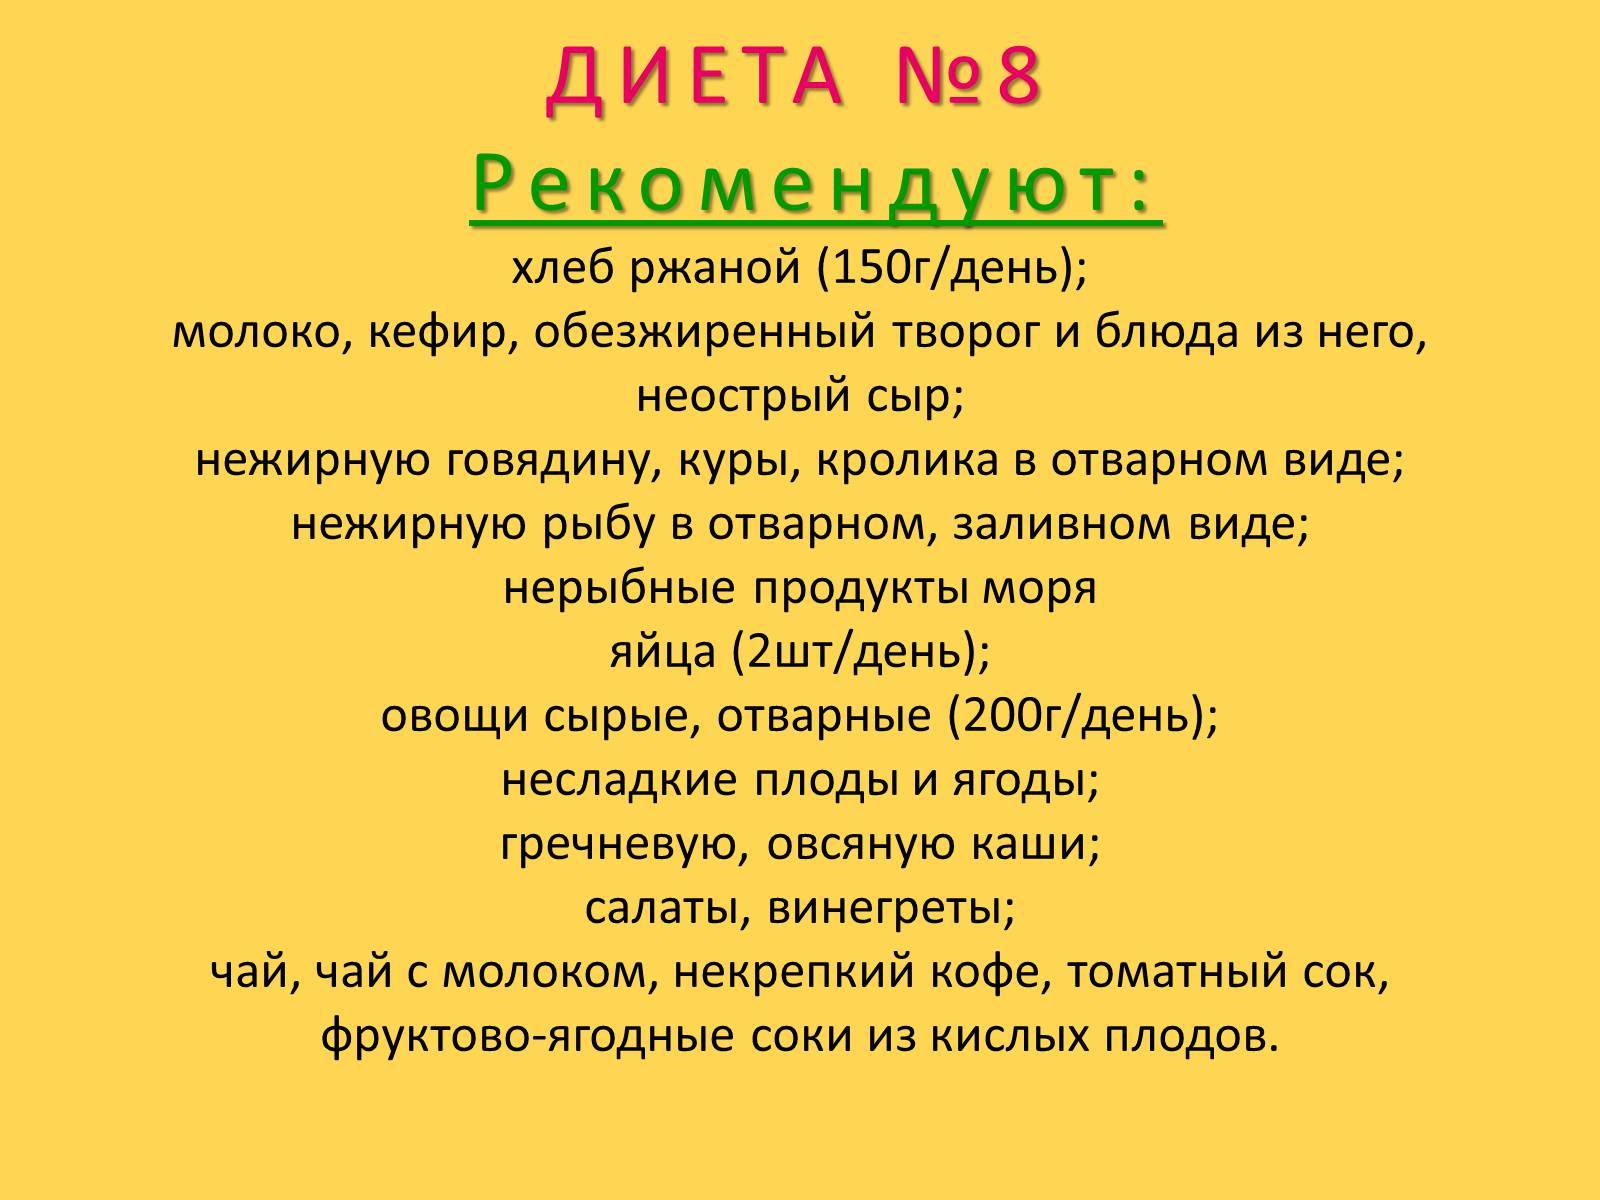 Диета 8 Рецепты. Диета стол номер 8